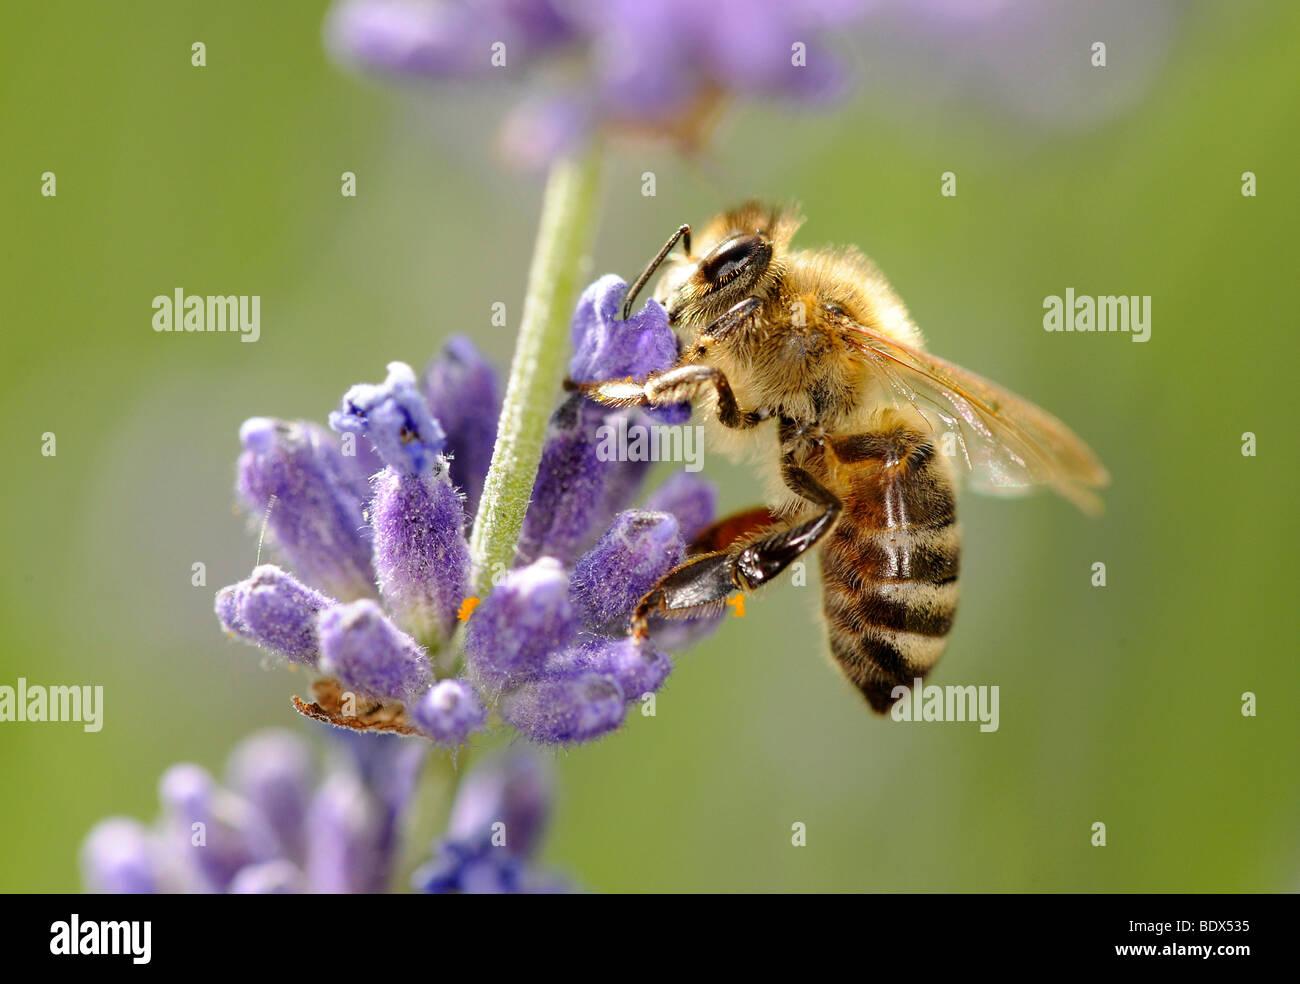 Honeybee (Apis) feeding on Common or True Lavender (Lavandula angustifolia) - Stock Image